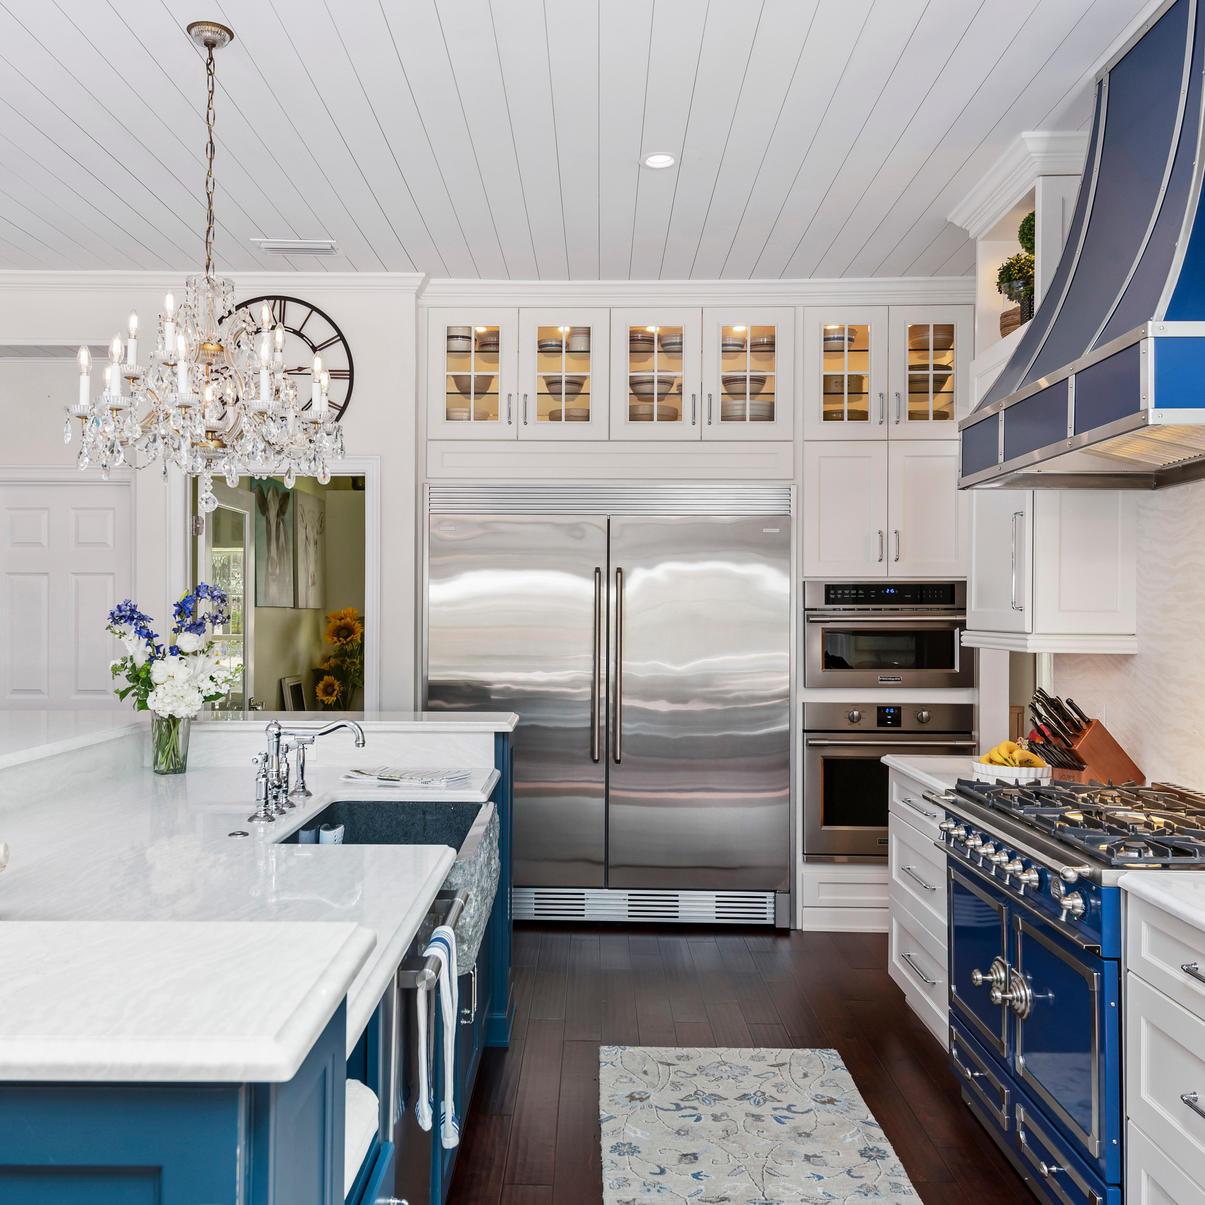 S&W Kitchens image 14